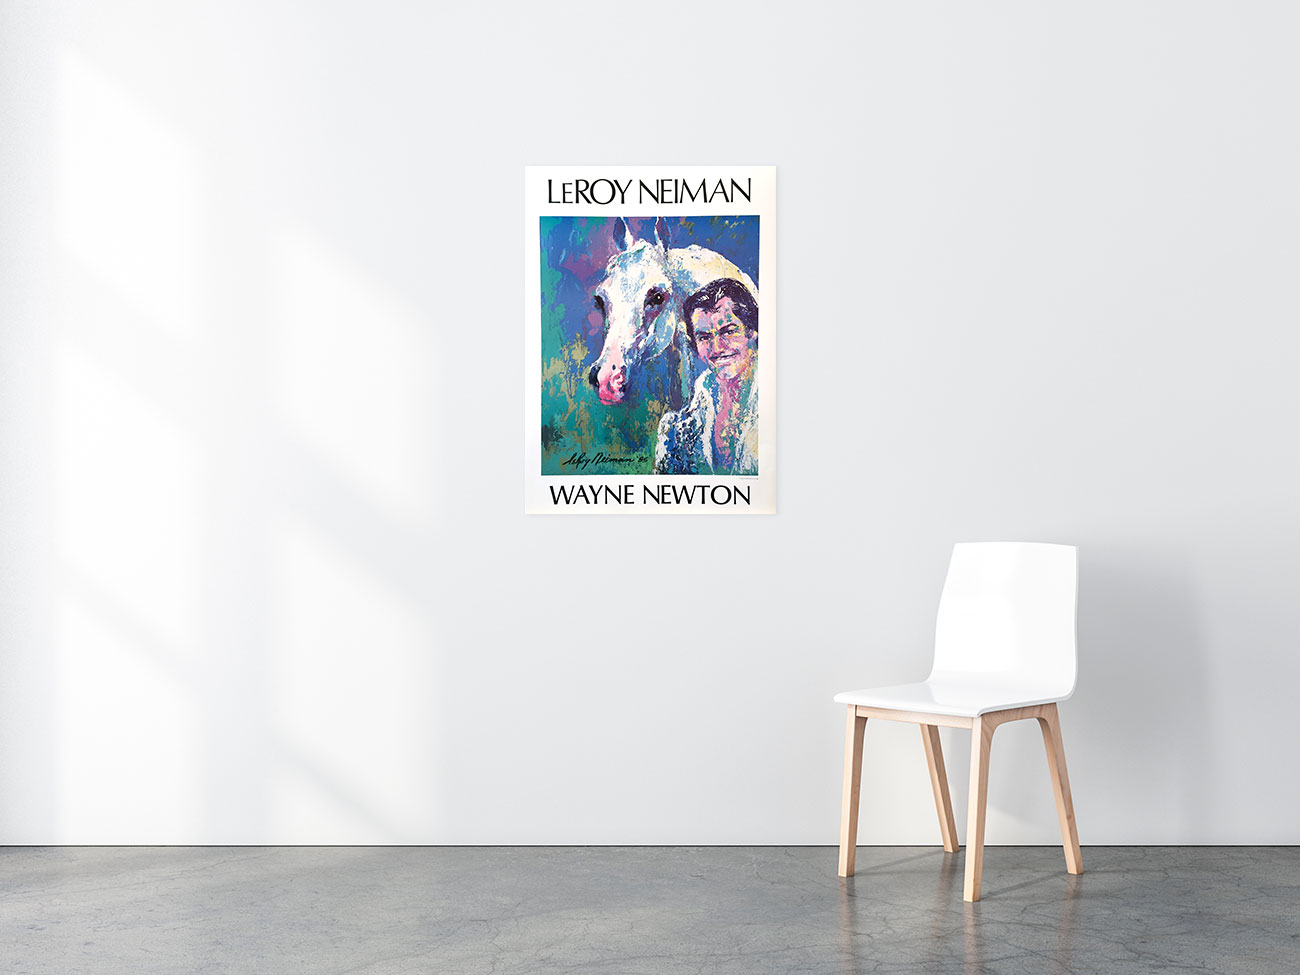 Wayne Newtown Poster in situ